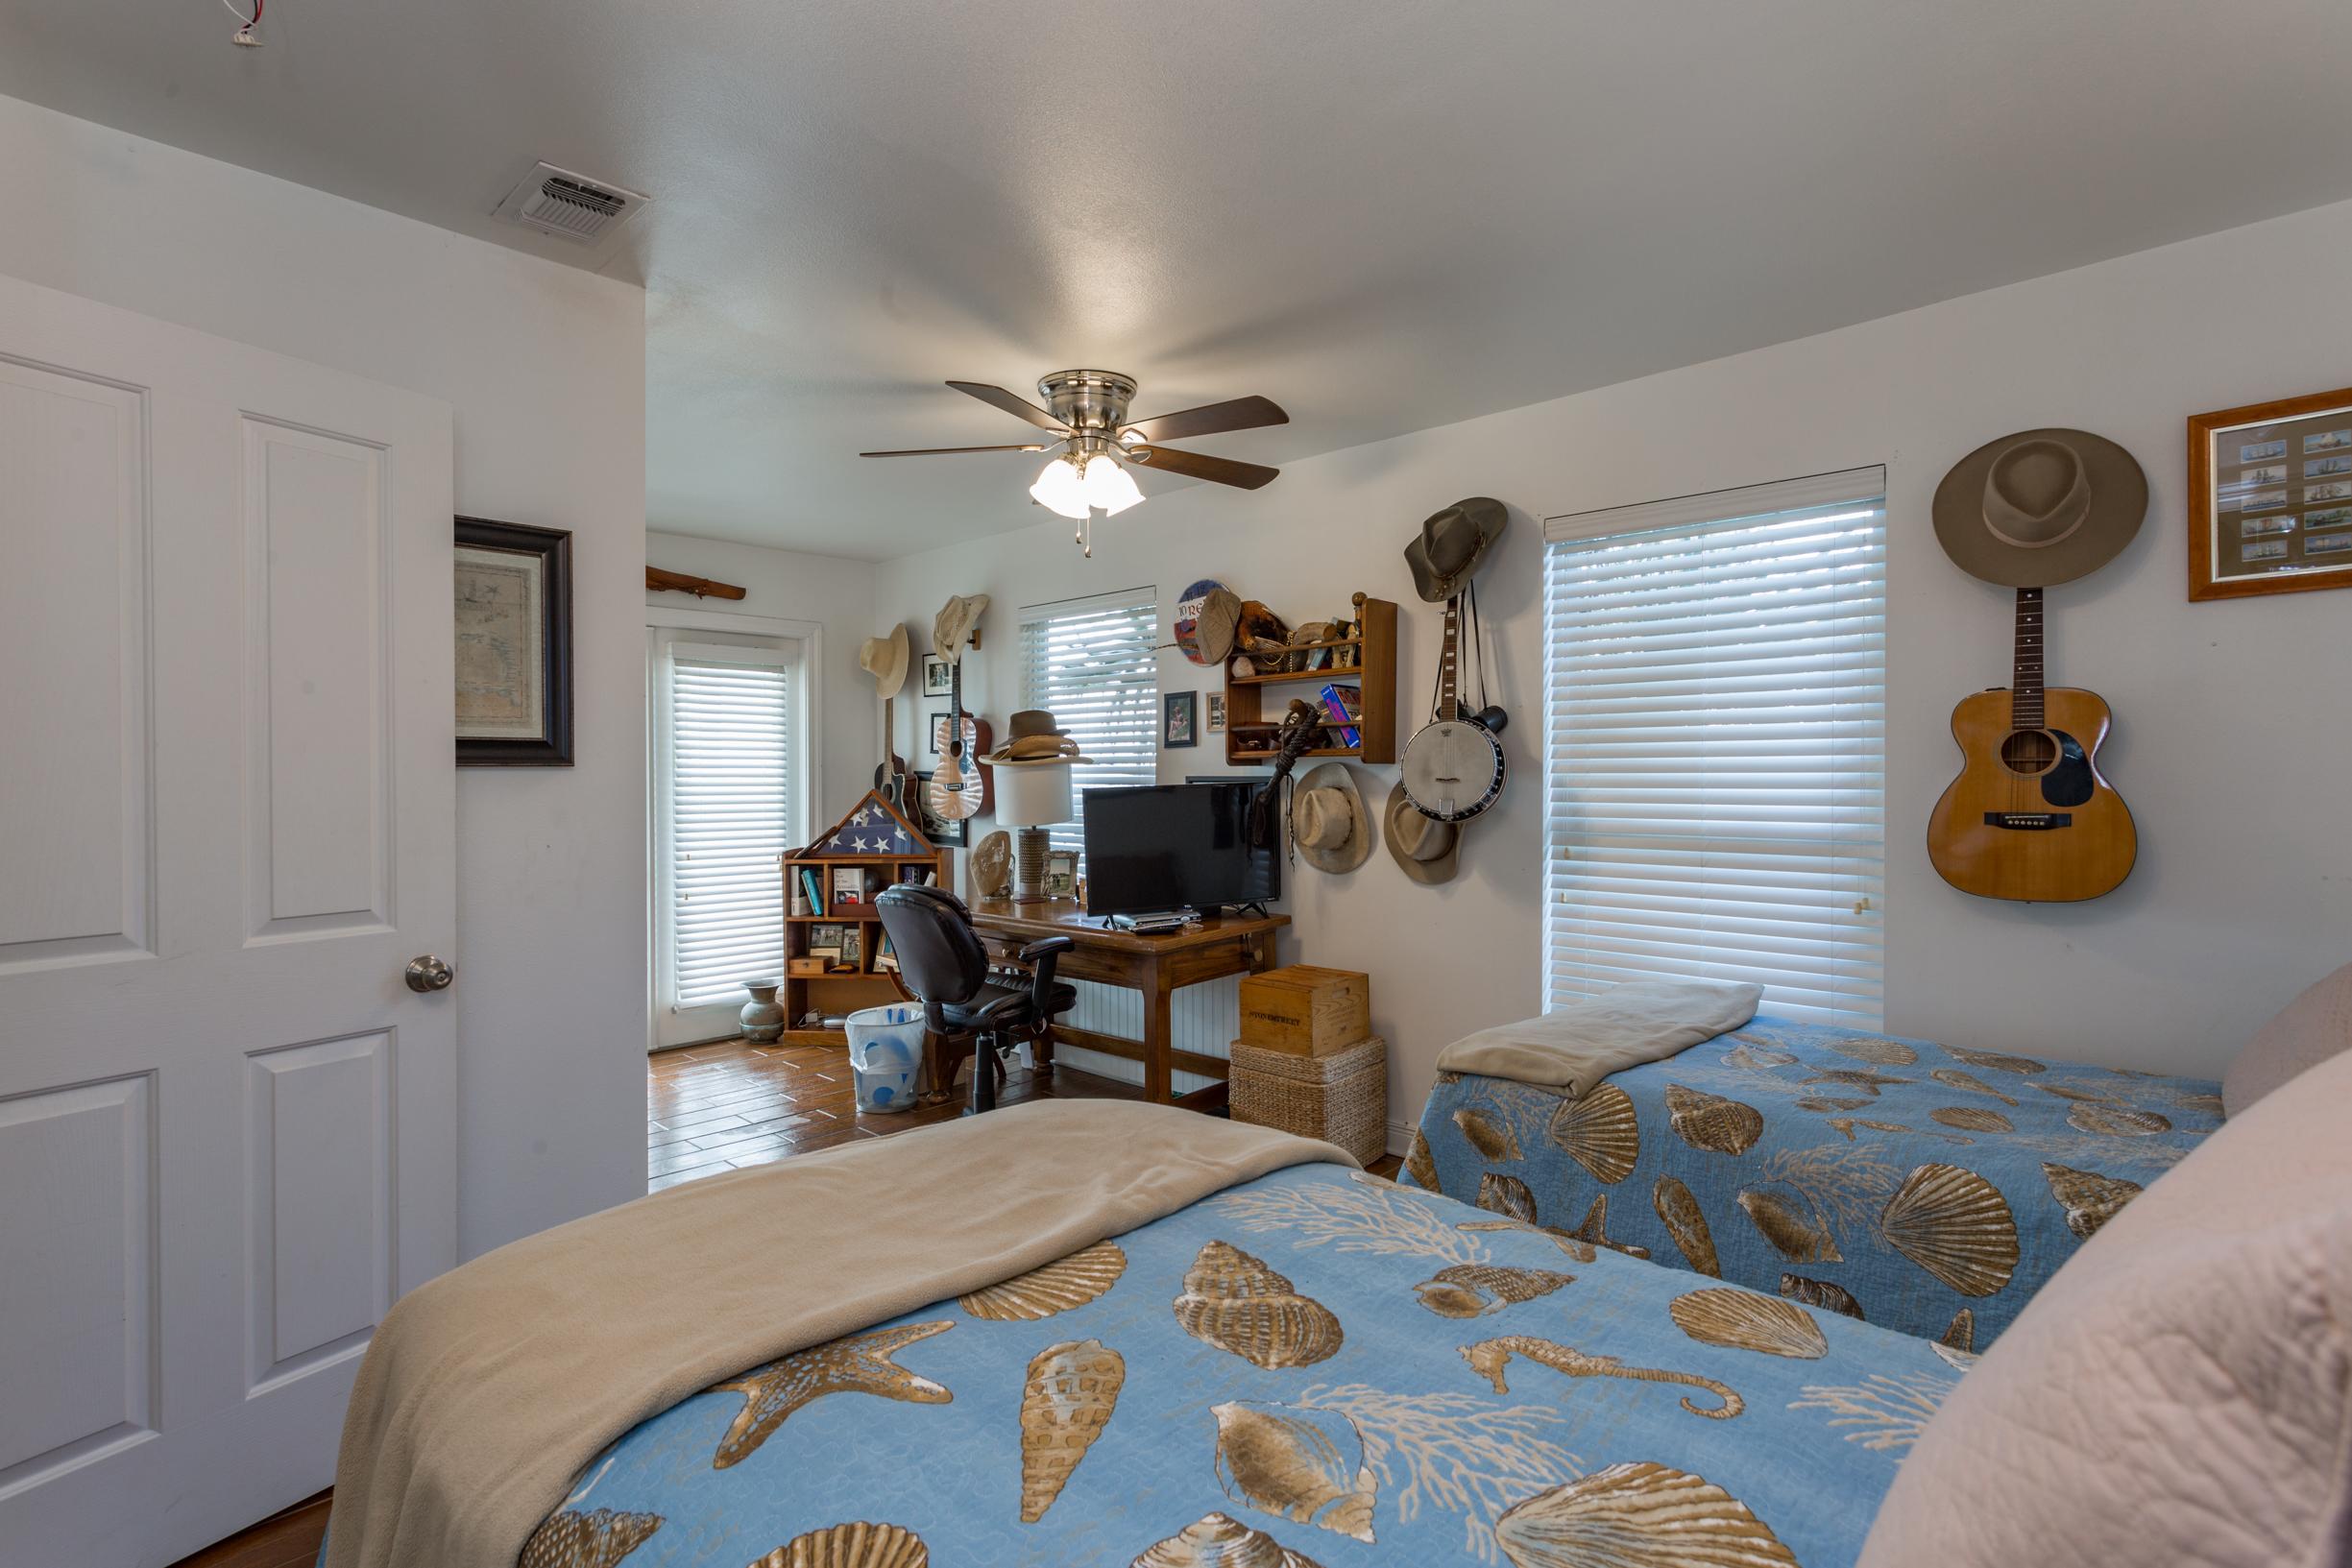 White Sands Cottage 501 Life's a Beach House Townhouse rental in White Sands Pensacola Beach in Pensacola Beach Florida - #22